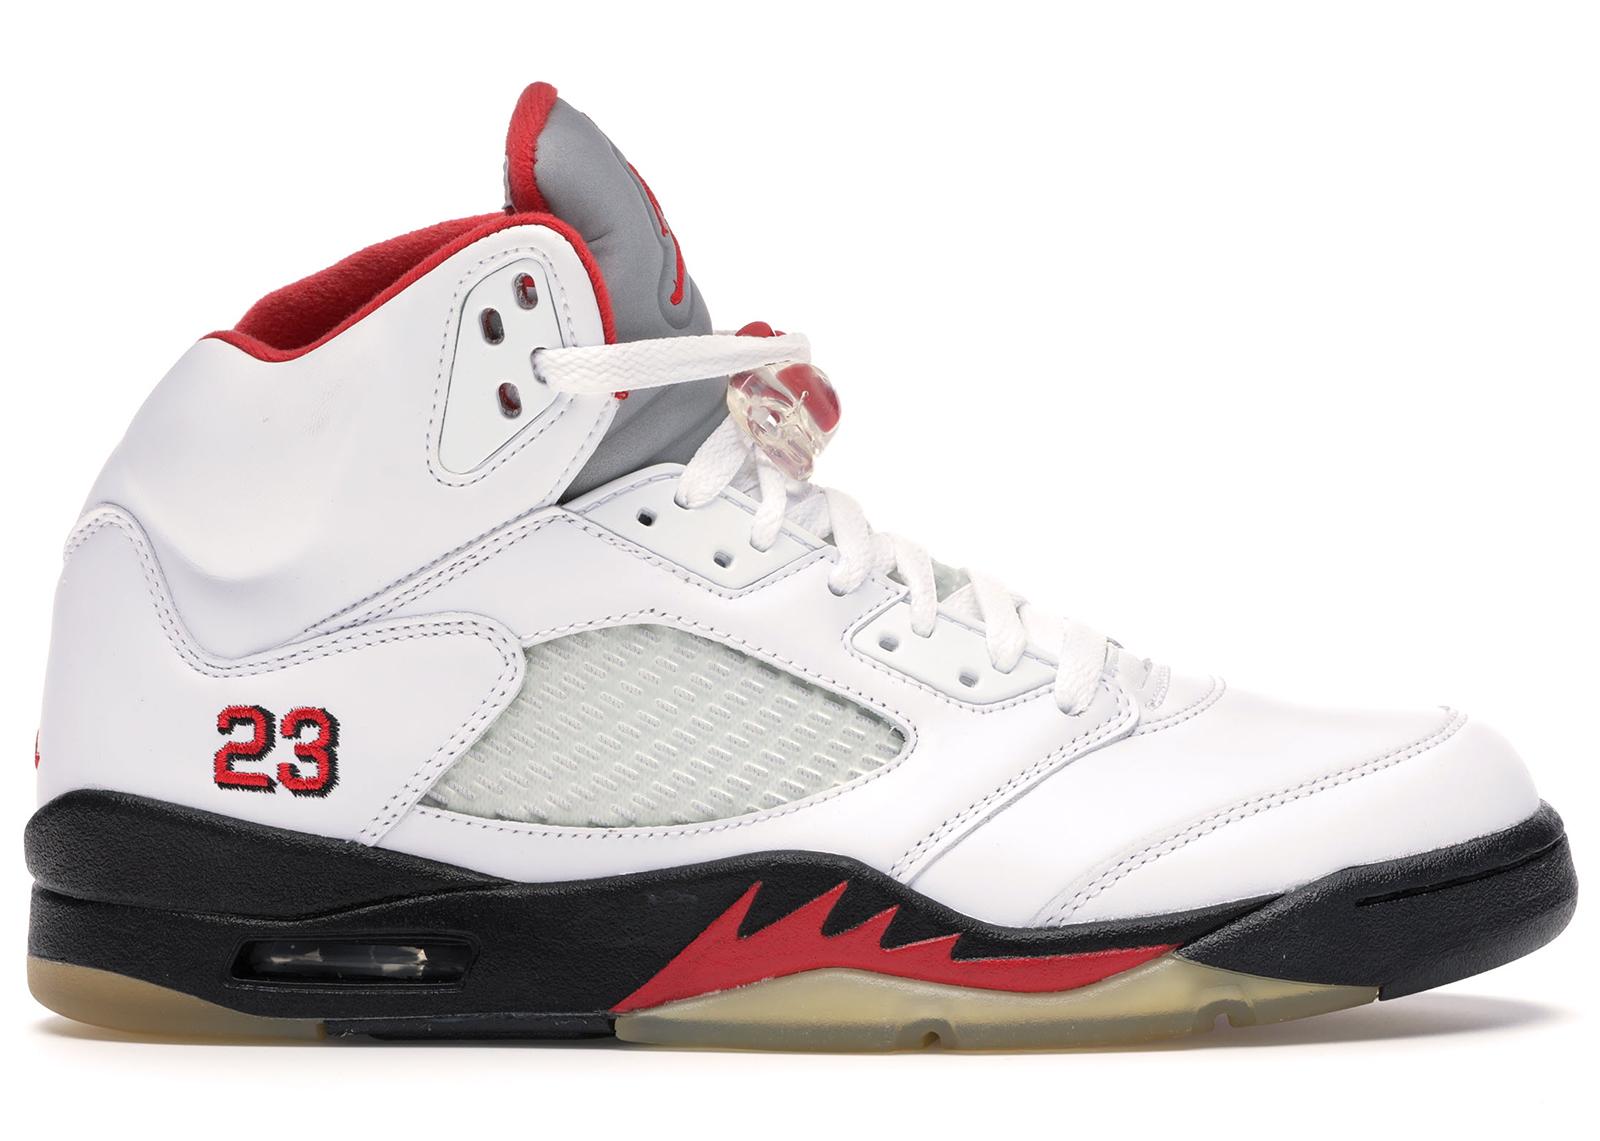 Jordan 5 Retro Fire Red CDP (2008